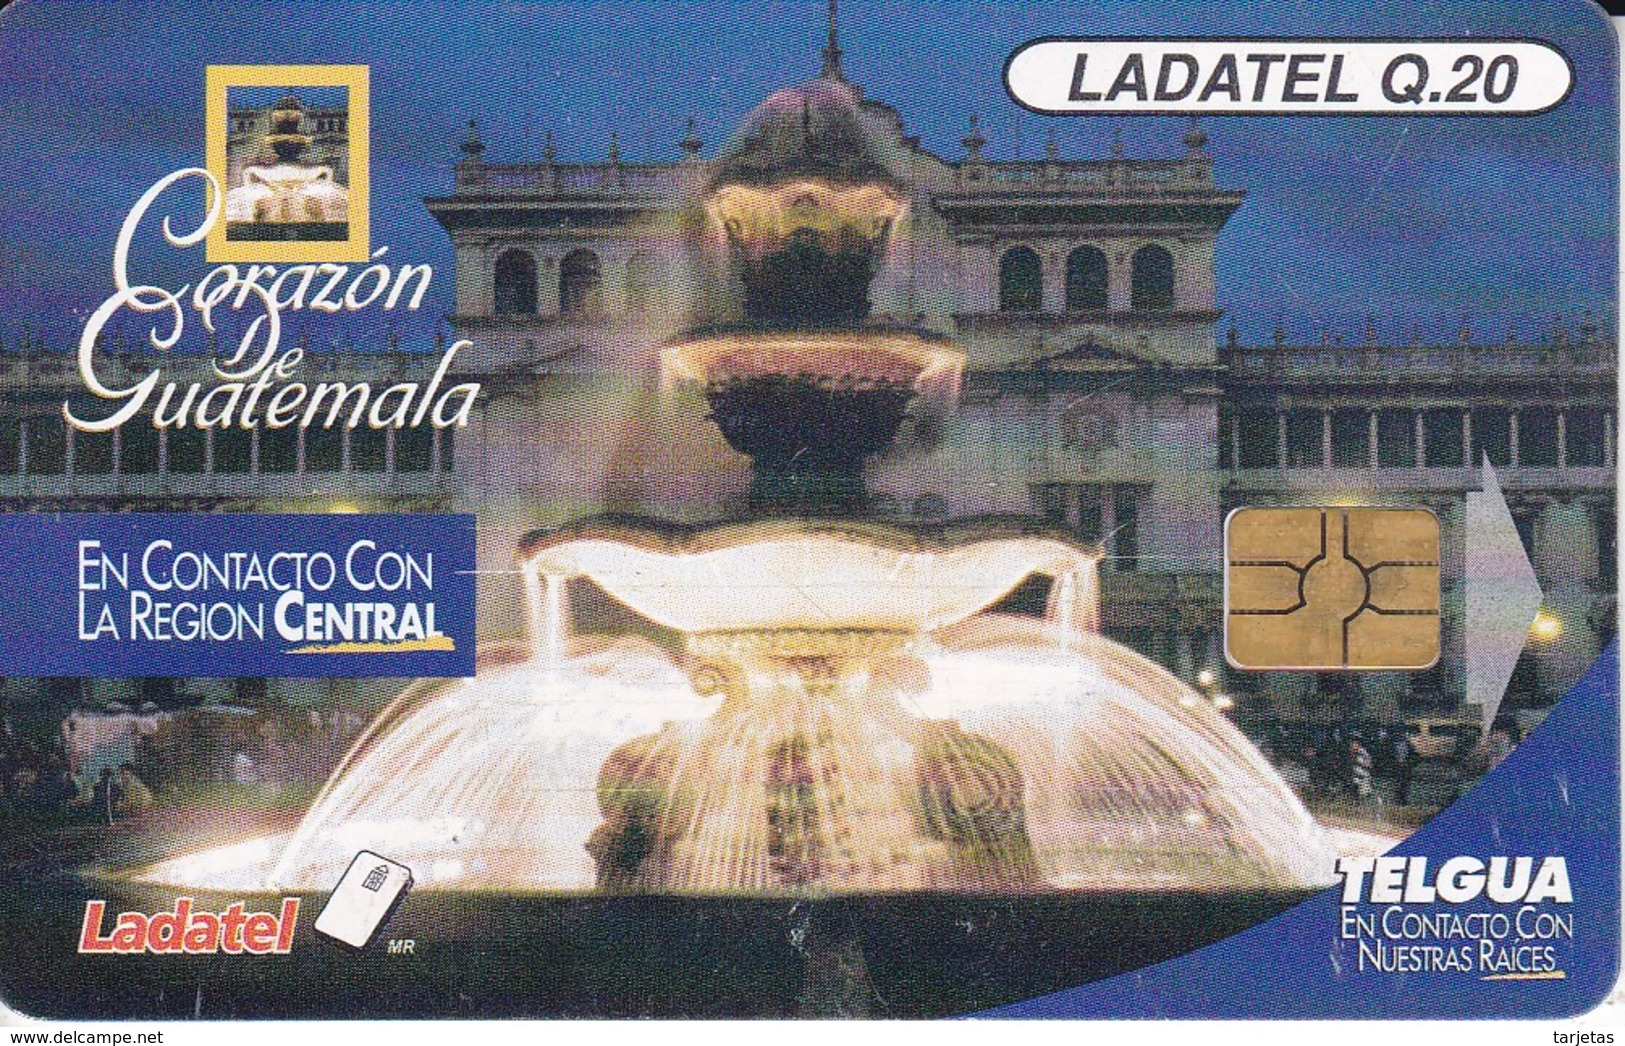 TARJETA DE GUATEMALA DEL CORAZON DE GUATEMALA (LADATEL) - Guatemala